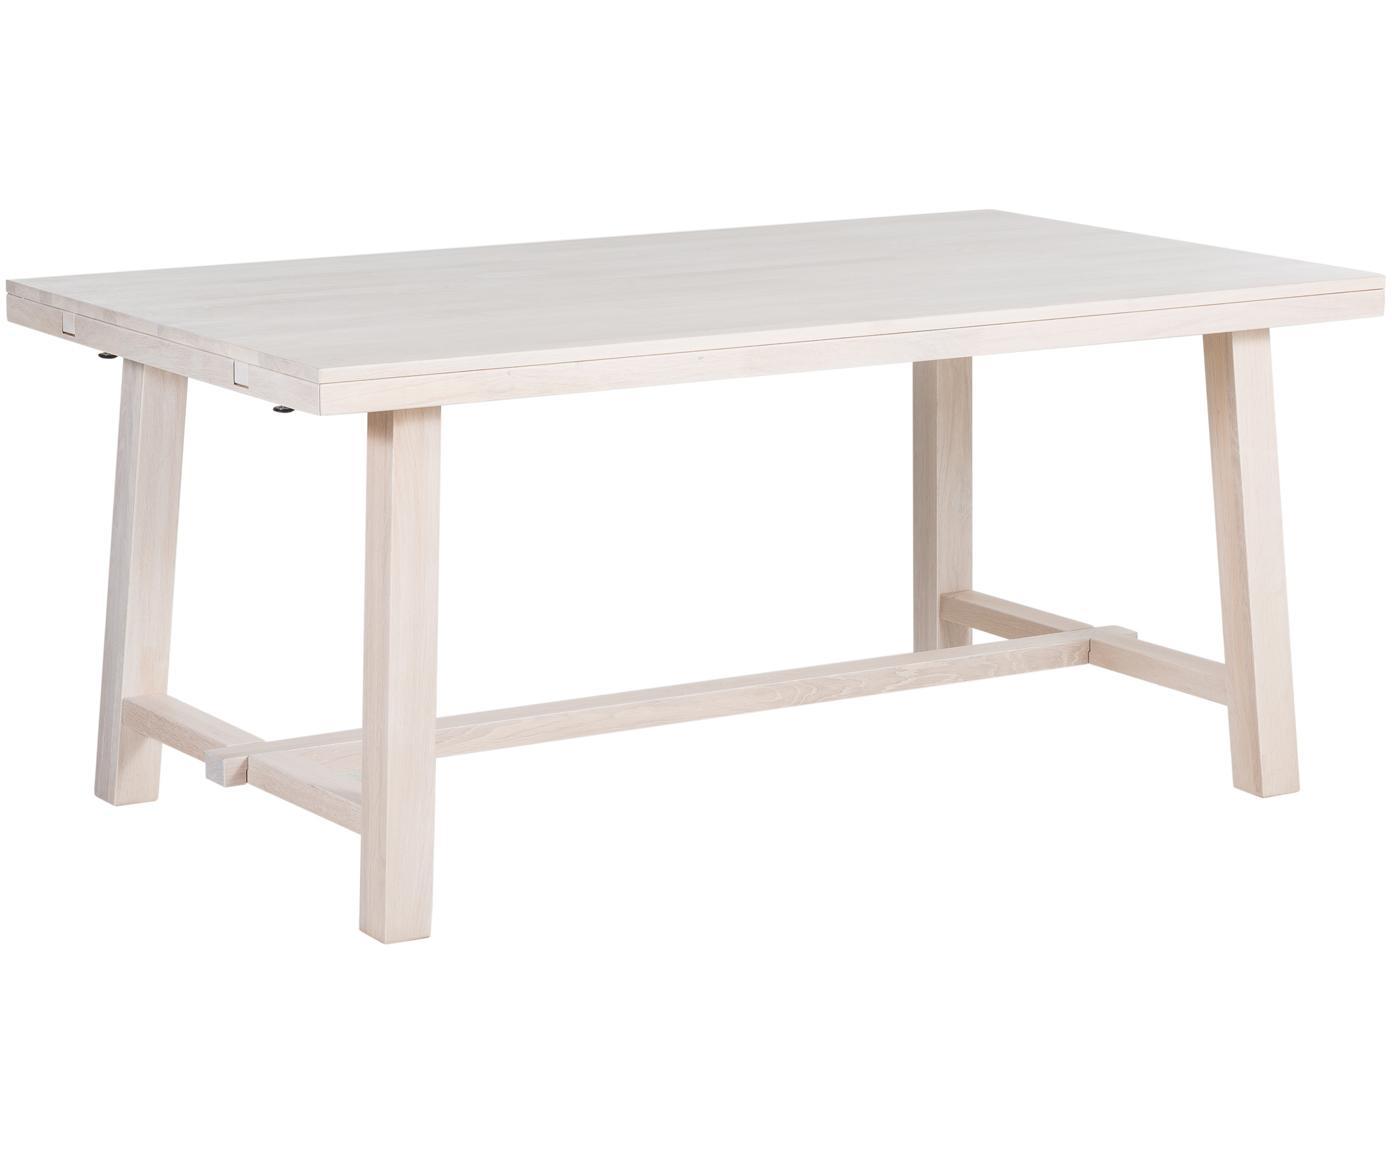 Mesa de comedor extensible de madera maciza Brooklyn, Madera de roble maciza, blanqueada y aceitada, Madera de roble, blanqueada, An 170-220 x F 95 cm